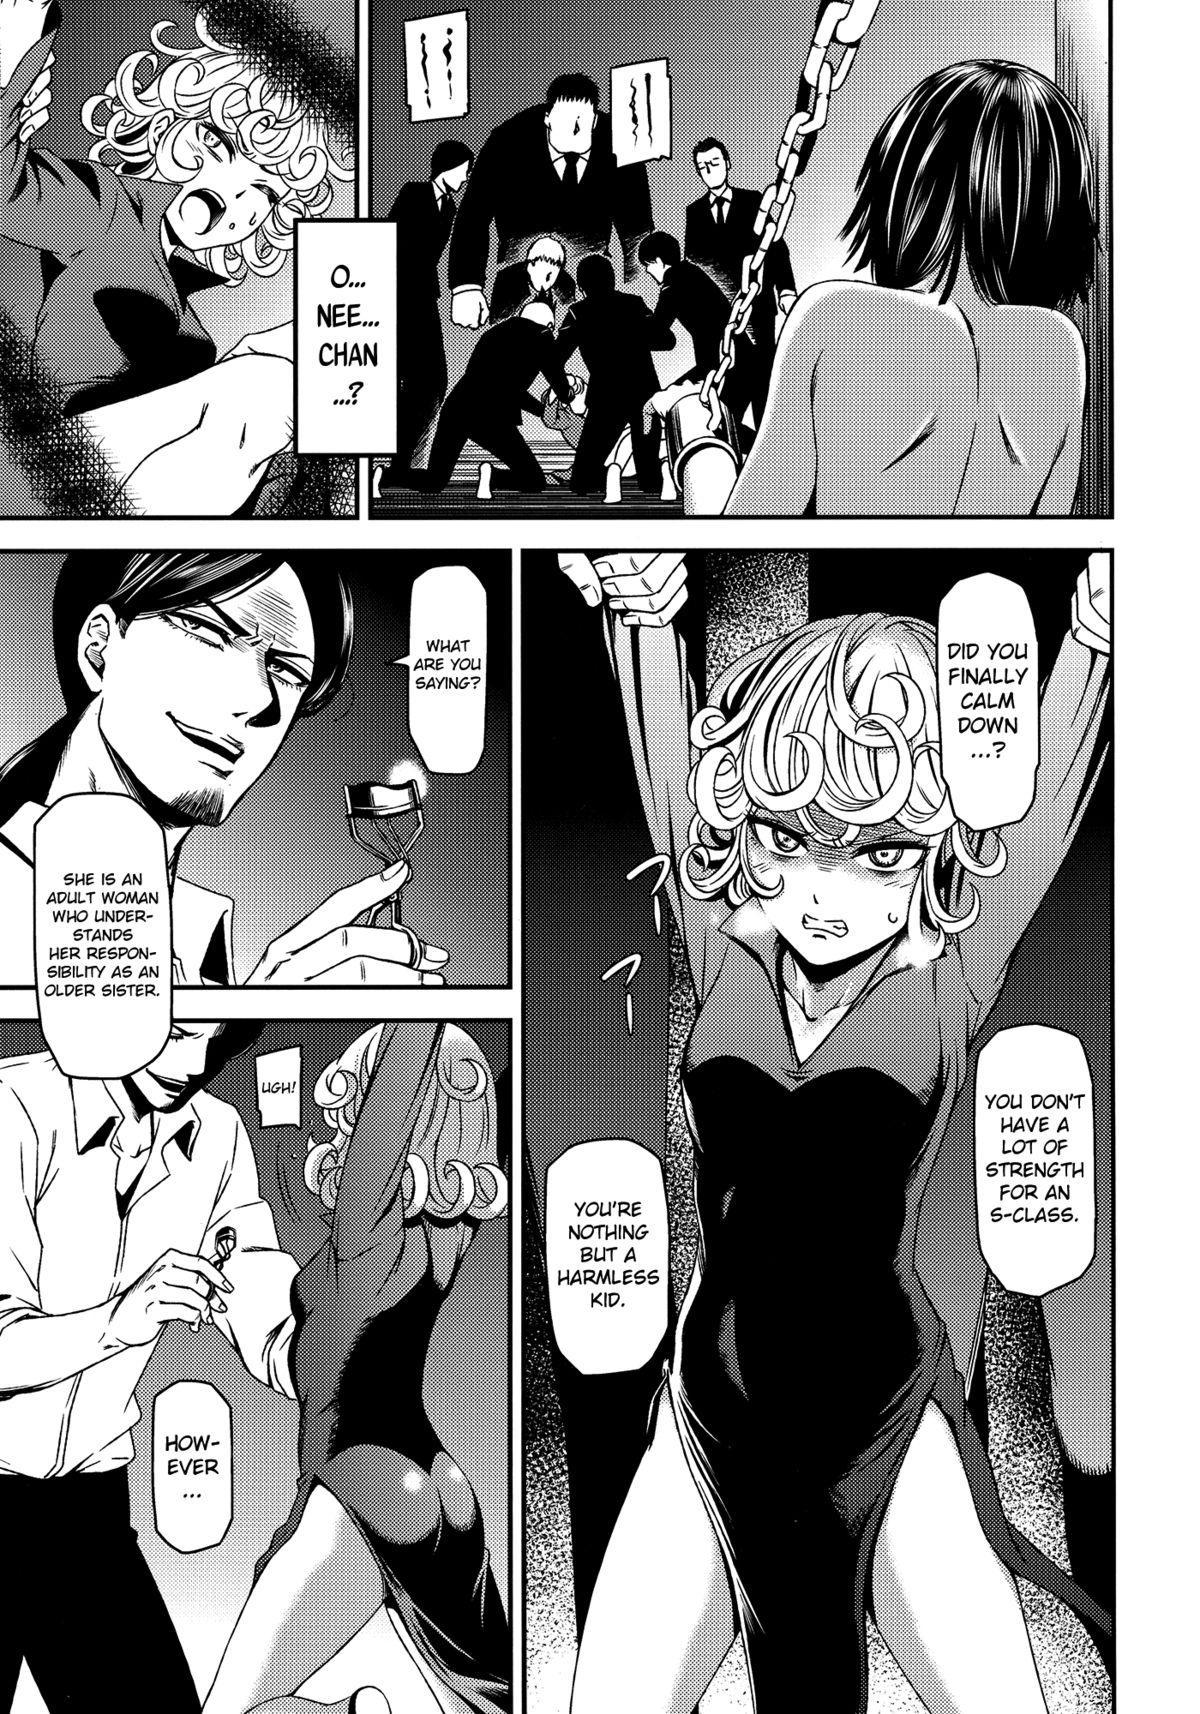 (C89) [Kiyosumi Hurricane (Kiyosumi Hurricane)] ONE-HURRICANE - Kutsujoku no Tatsumaki (One Punch Man) [English] [MintVoid] 3